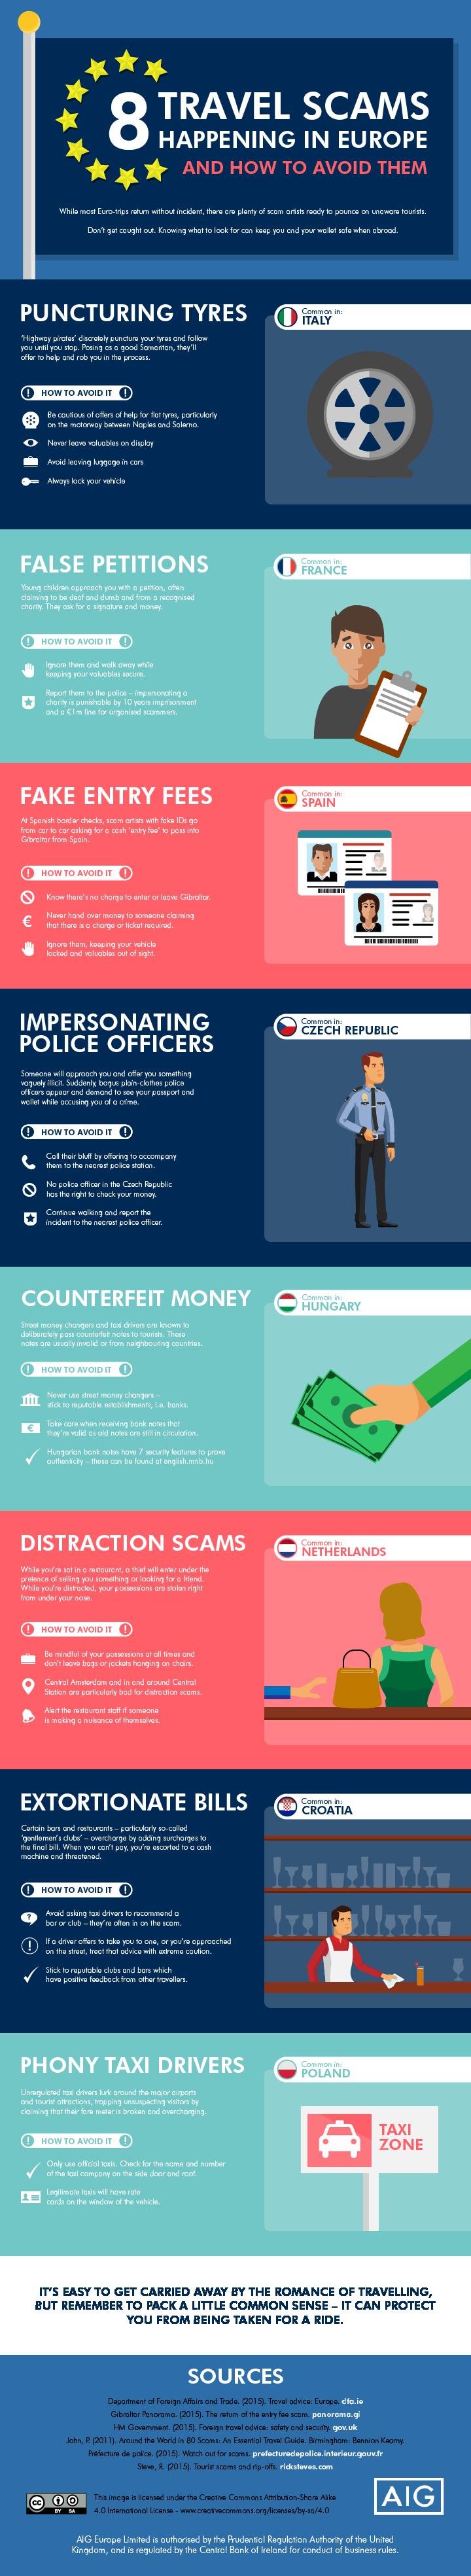 European Tourist Scams - 7 tips to avoid tourist scams in europe